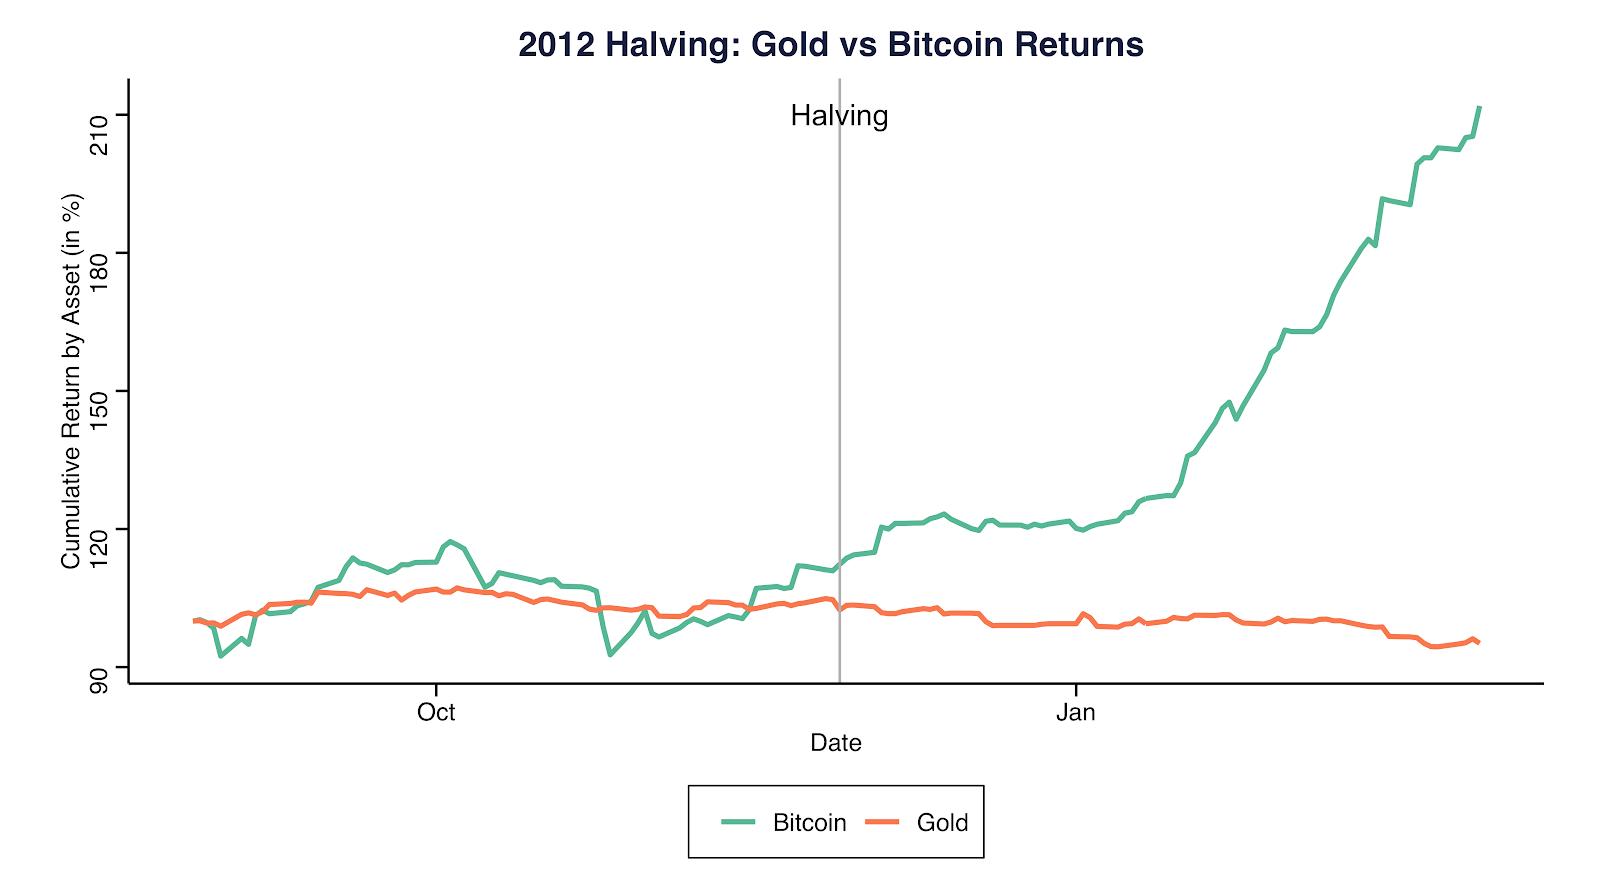 Halving de 2012: Retorno del oro vs. Bitcoin. Fuente: Coinmetrics.io y Gold.org